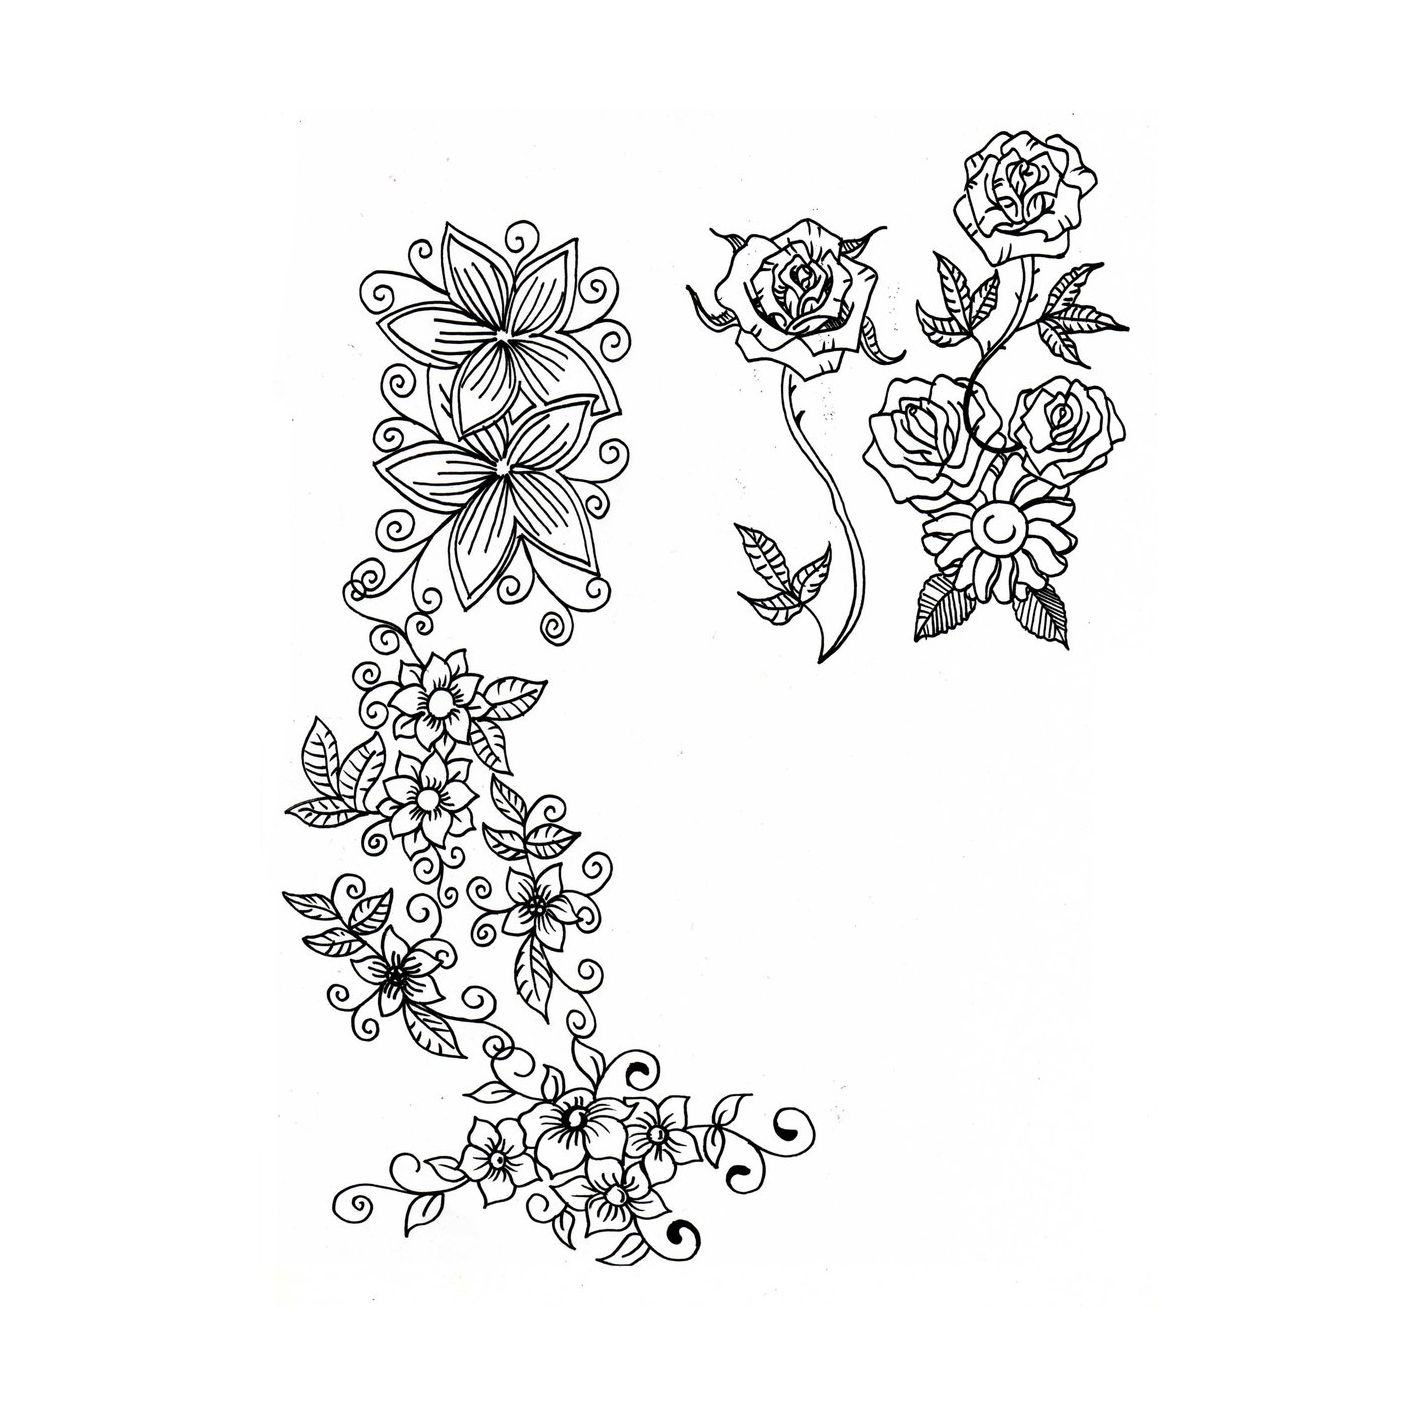 Flores Enredaderas Para Colorear Enredaderas Con Flores Enredaderas Colores